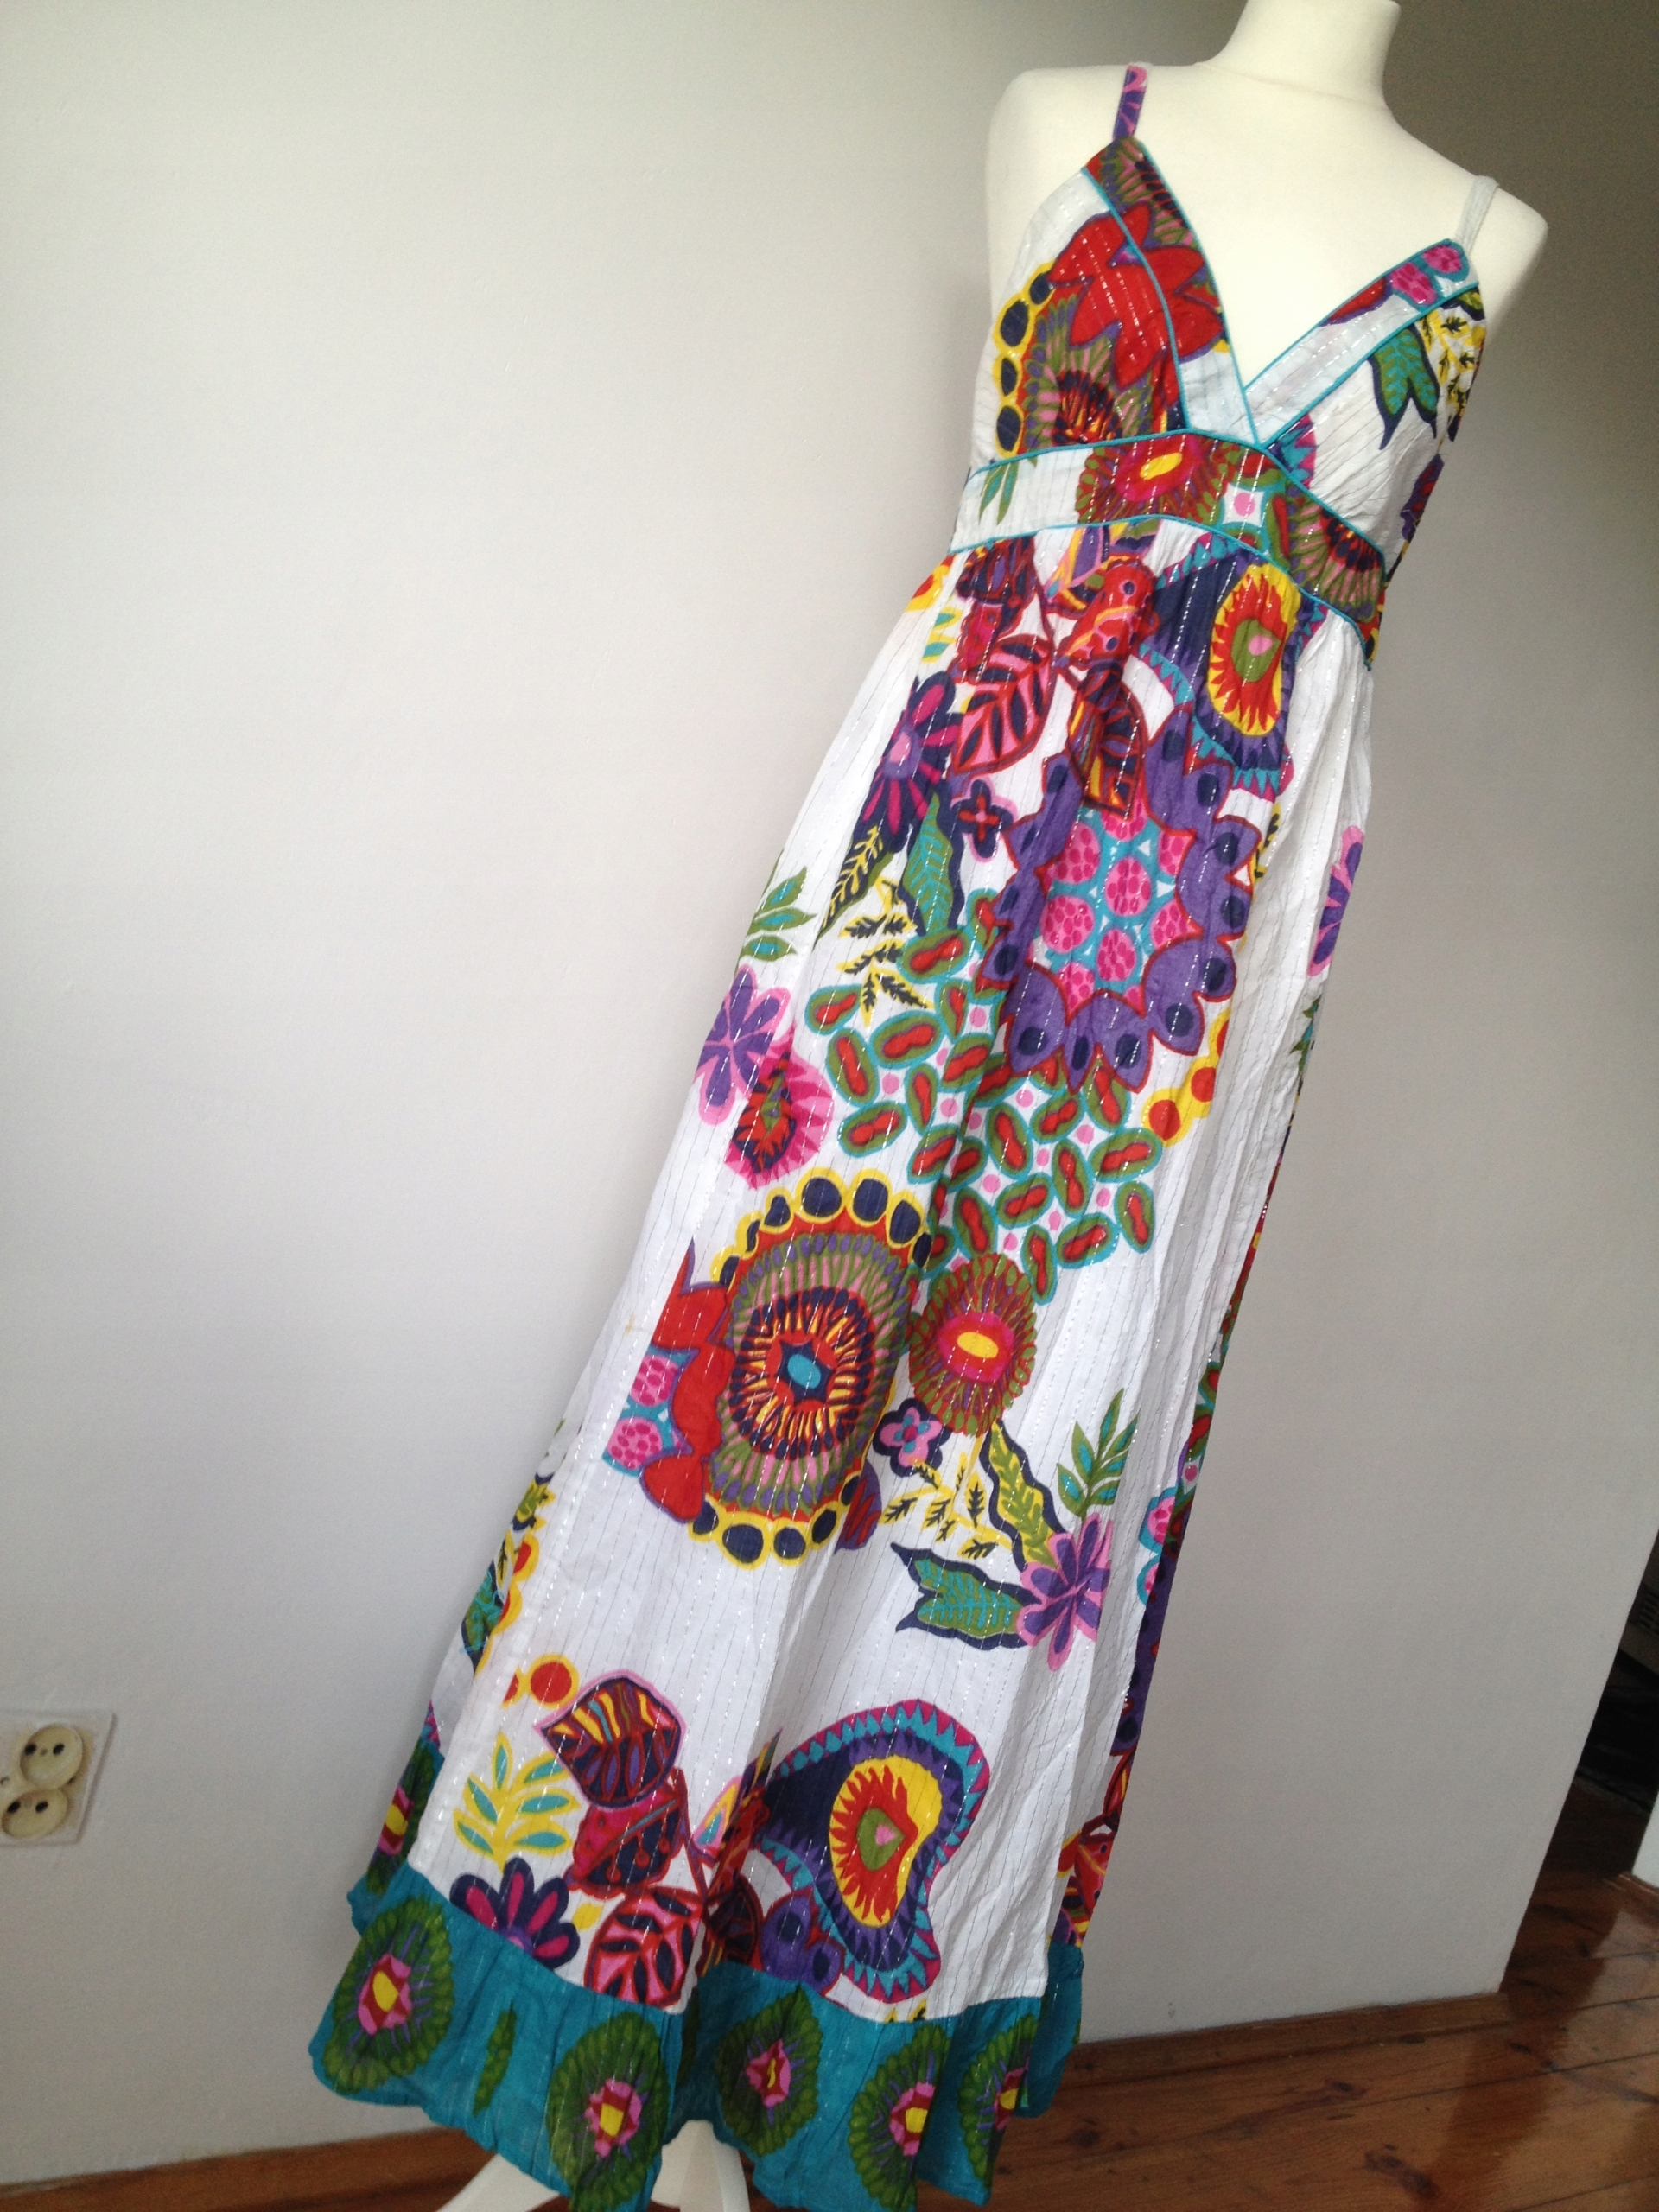 55594d9f26 DESIGUAL - piękna sukienka NA LATO długa - 42 (XL) - 7453724091 ...